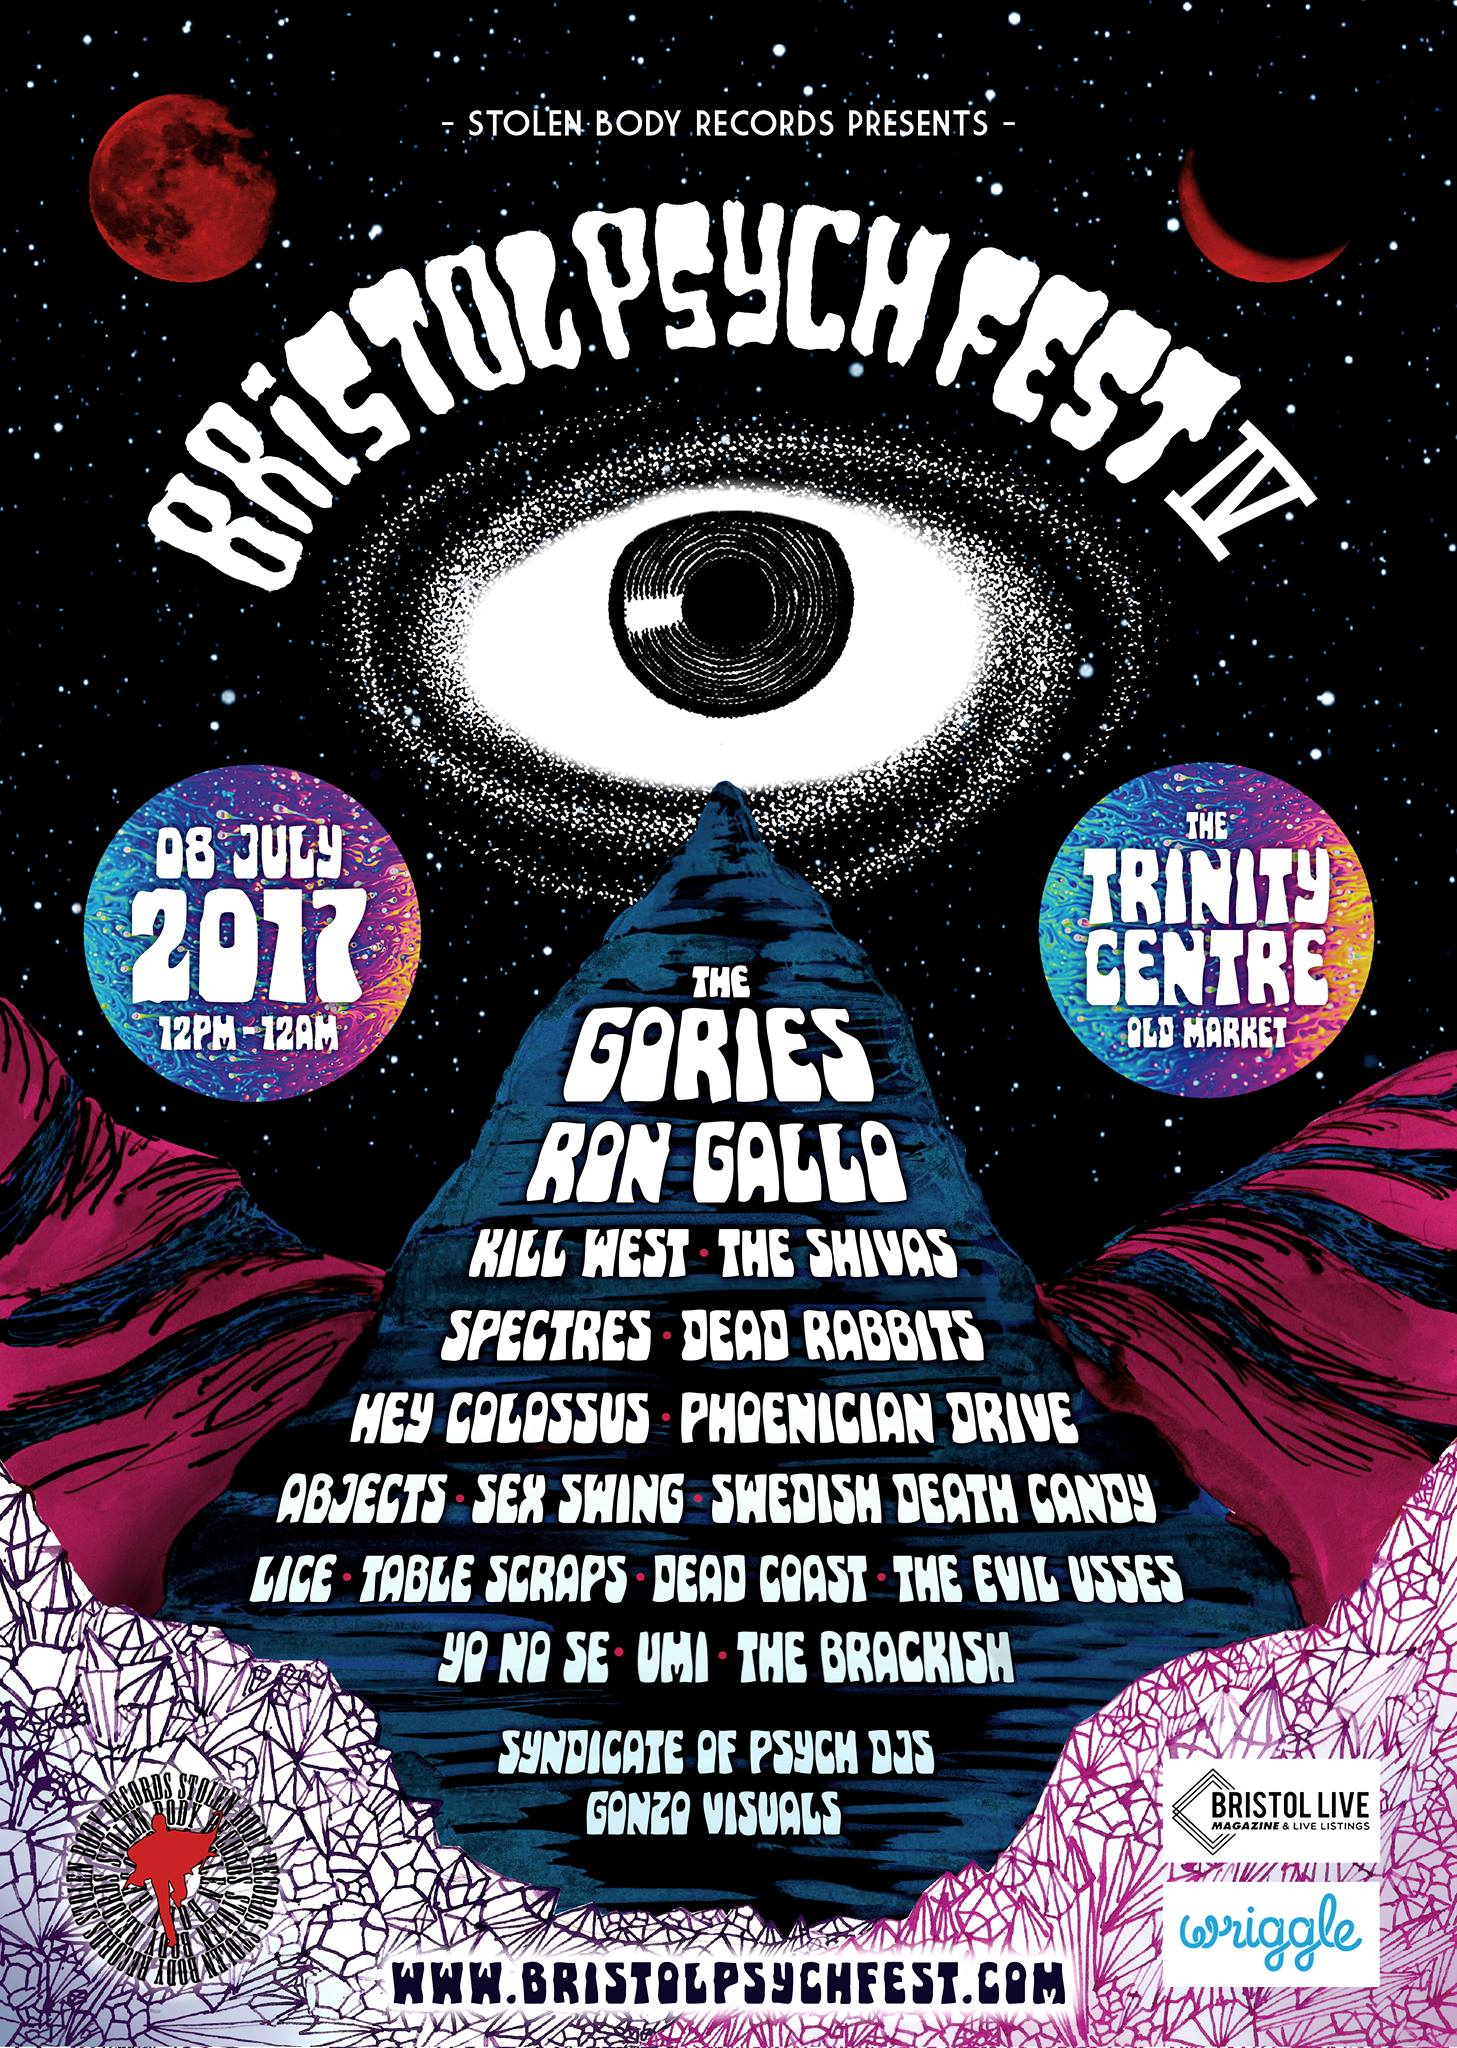 Bristol Psych Fest IV